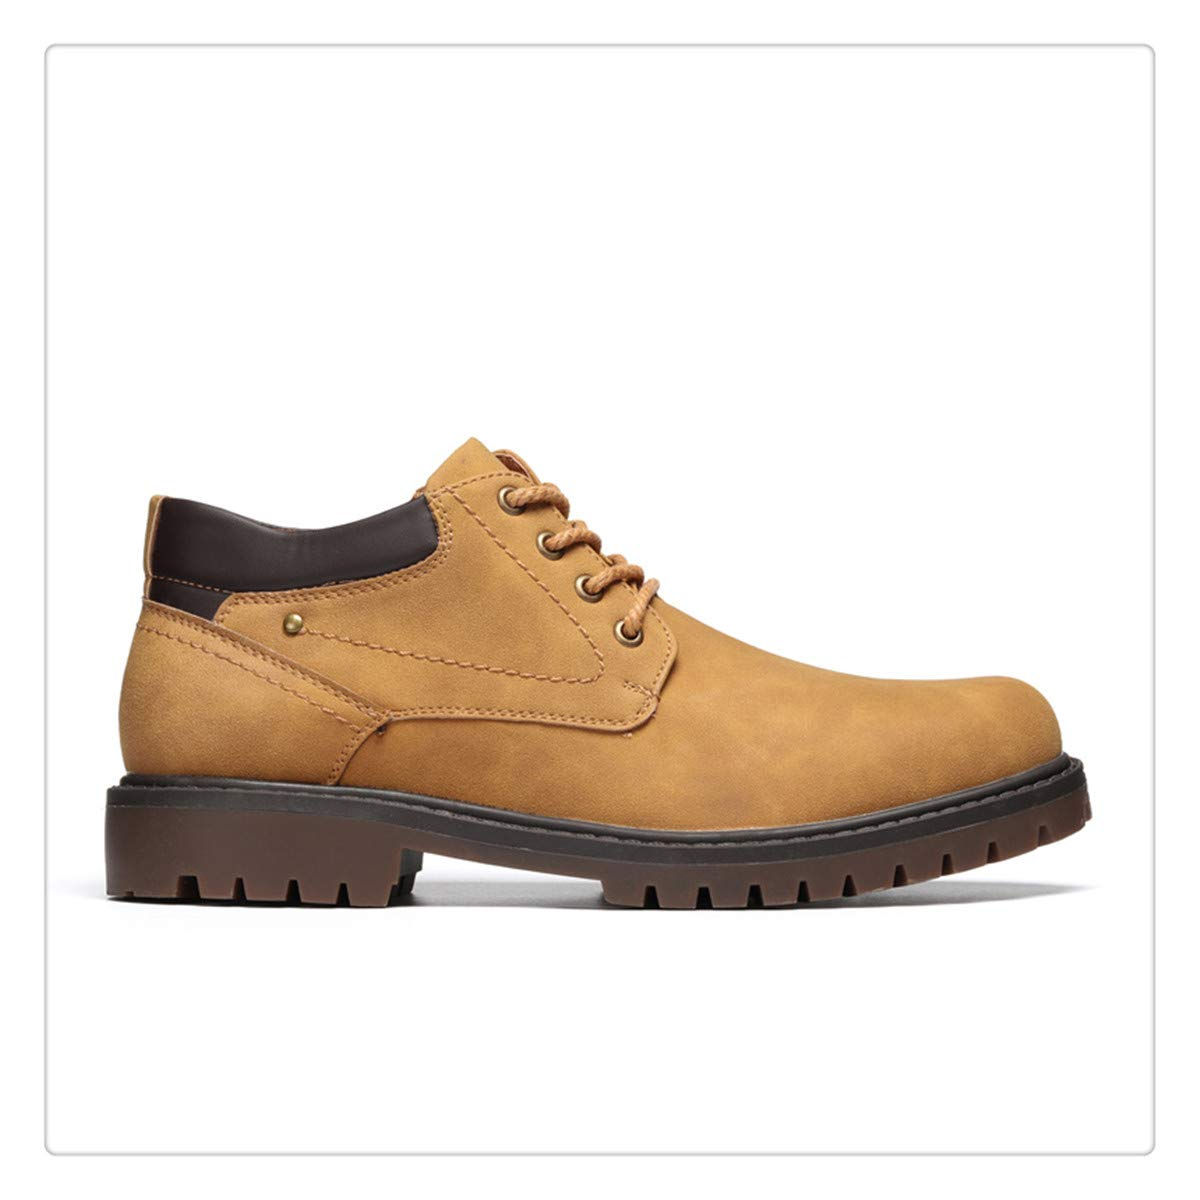 Hchengxianz 40-45 Men Winter Boots Warm Comfortable Working Safety Winter Men Shoes